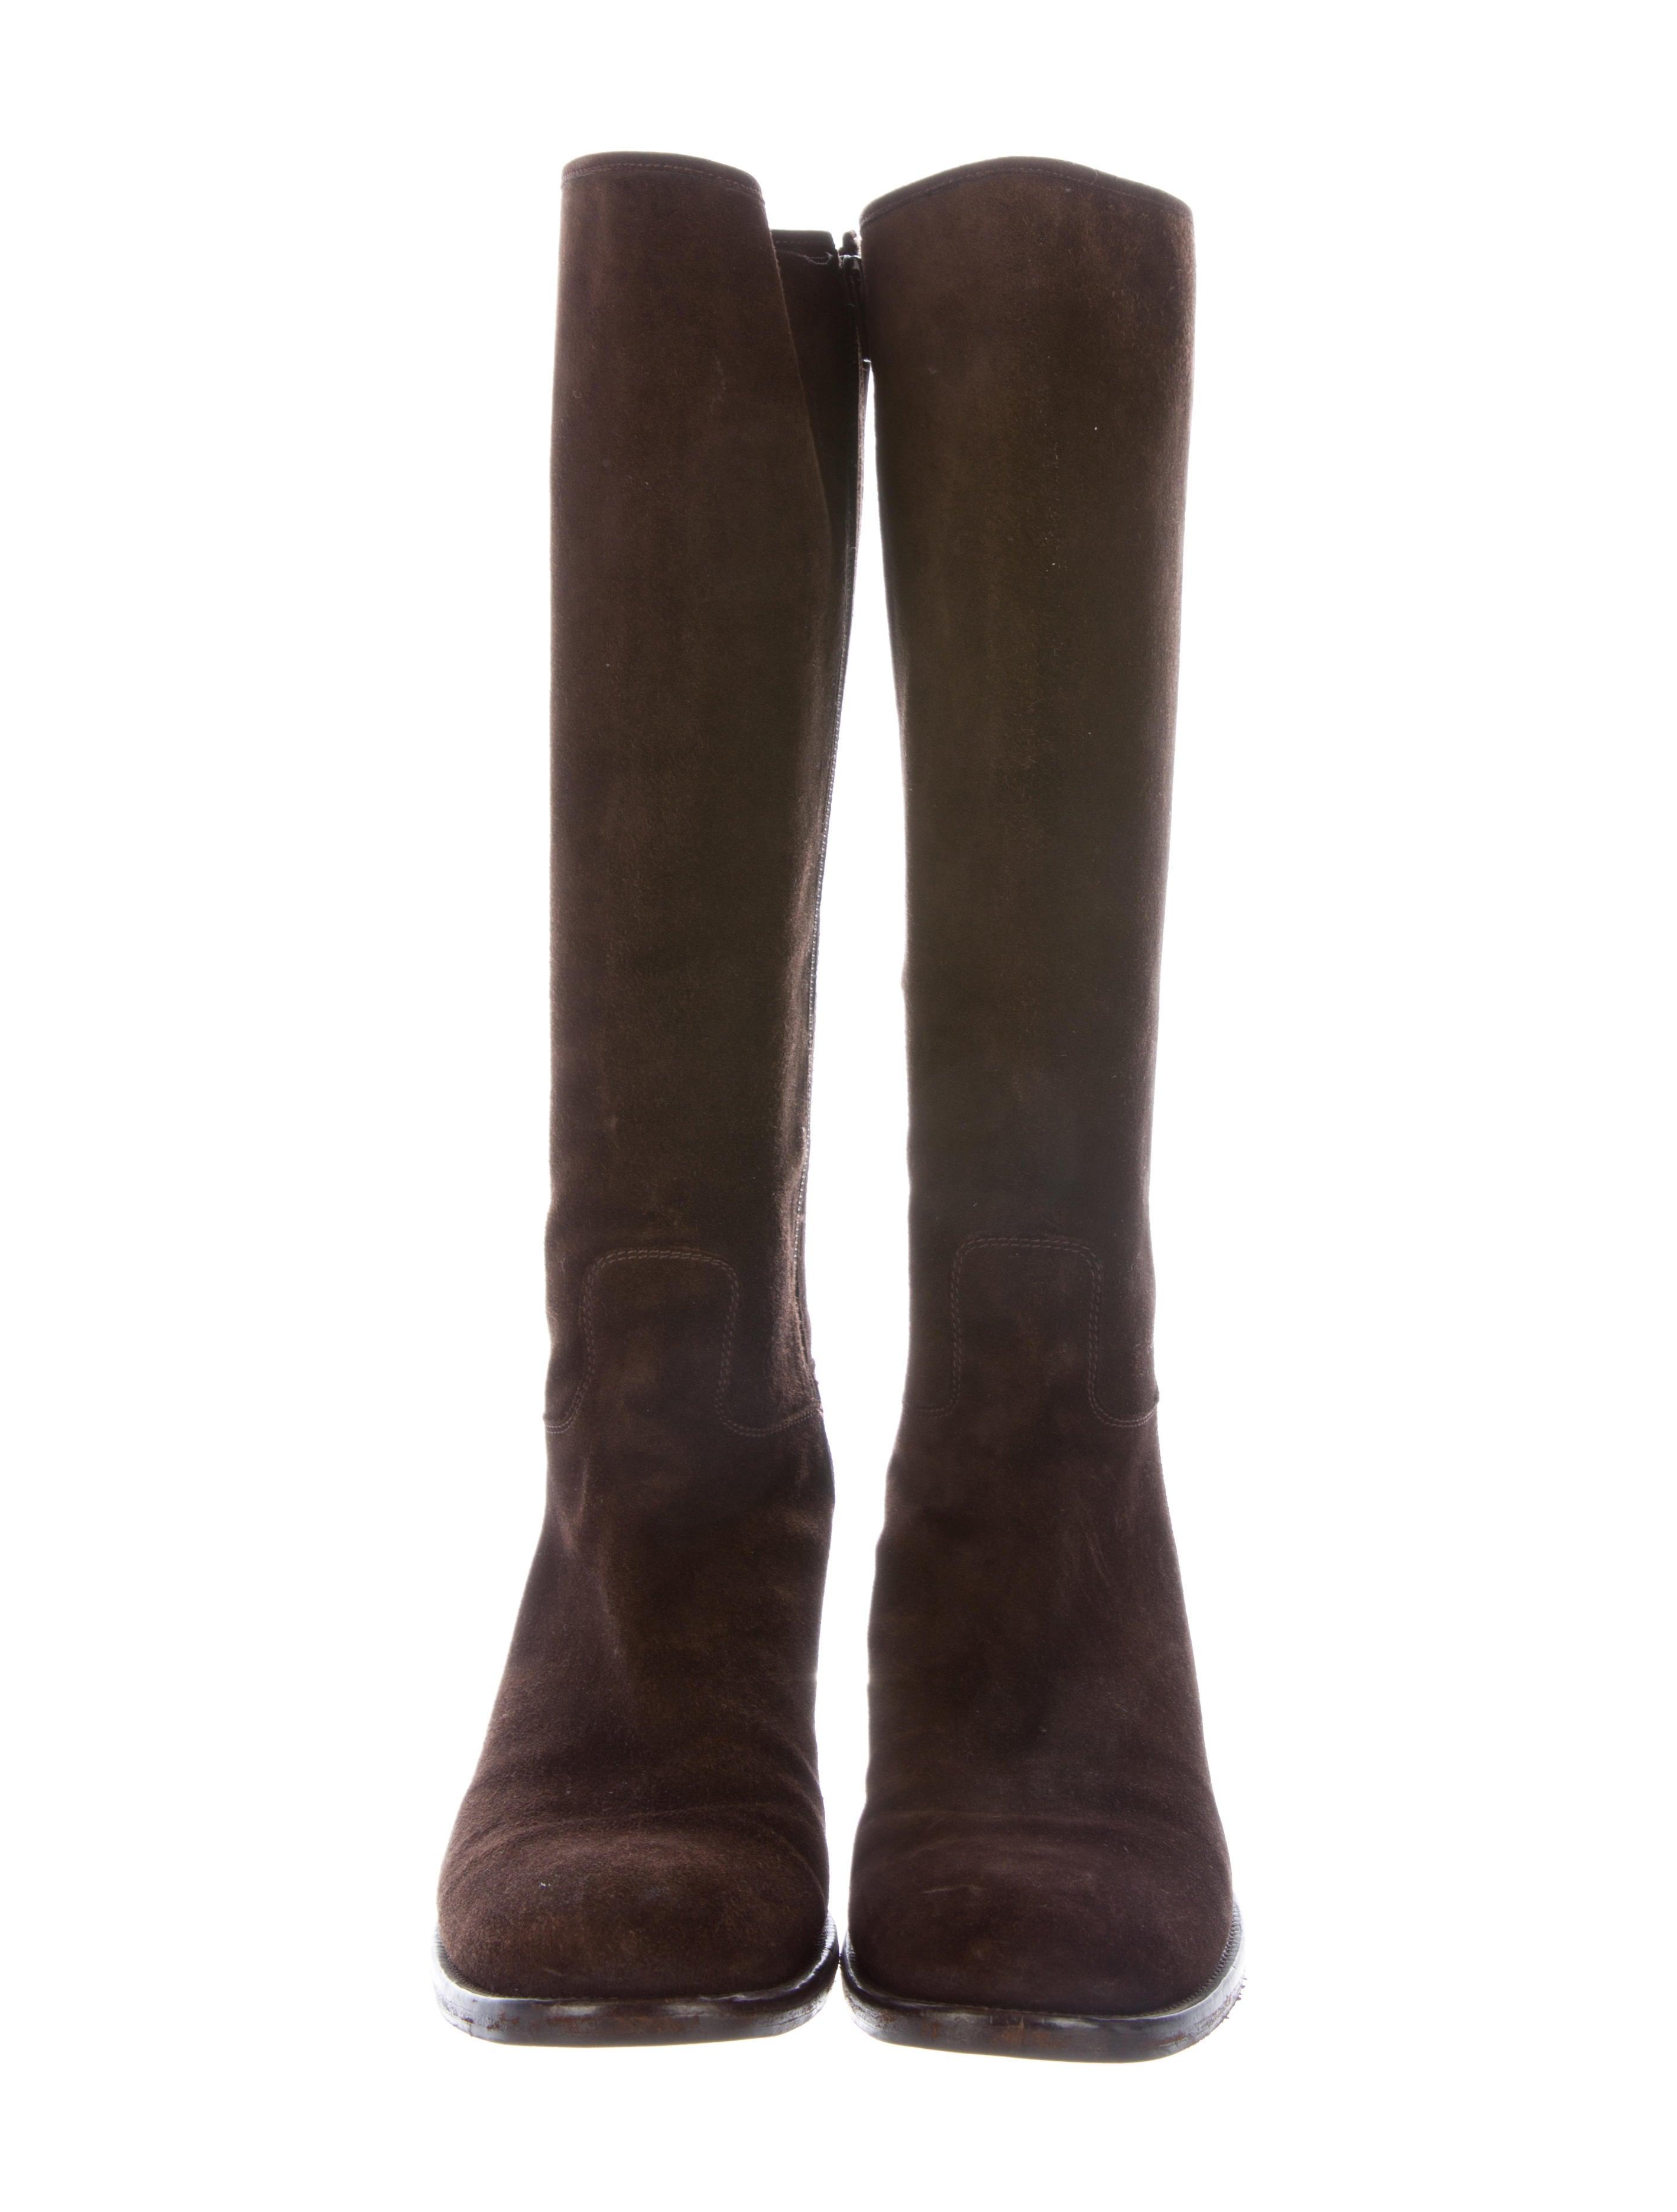 prada suede knee high boots shoes pra115089 the realreal